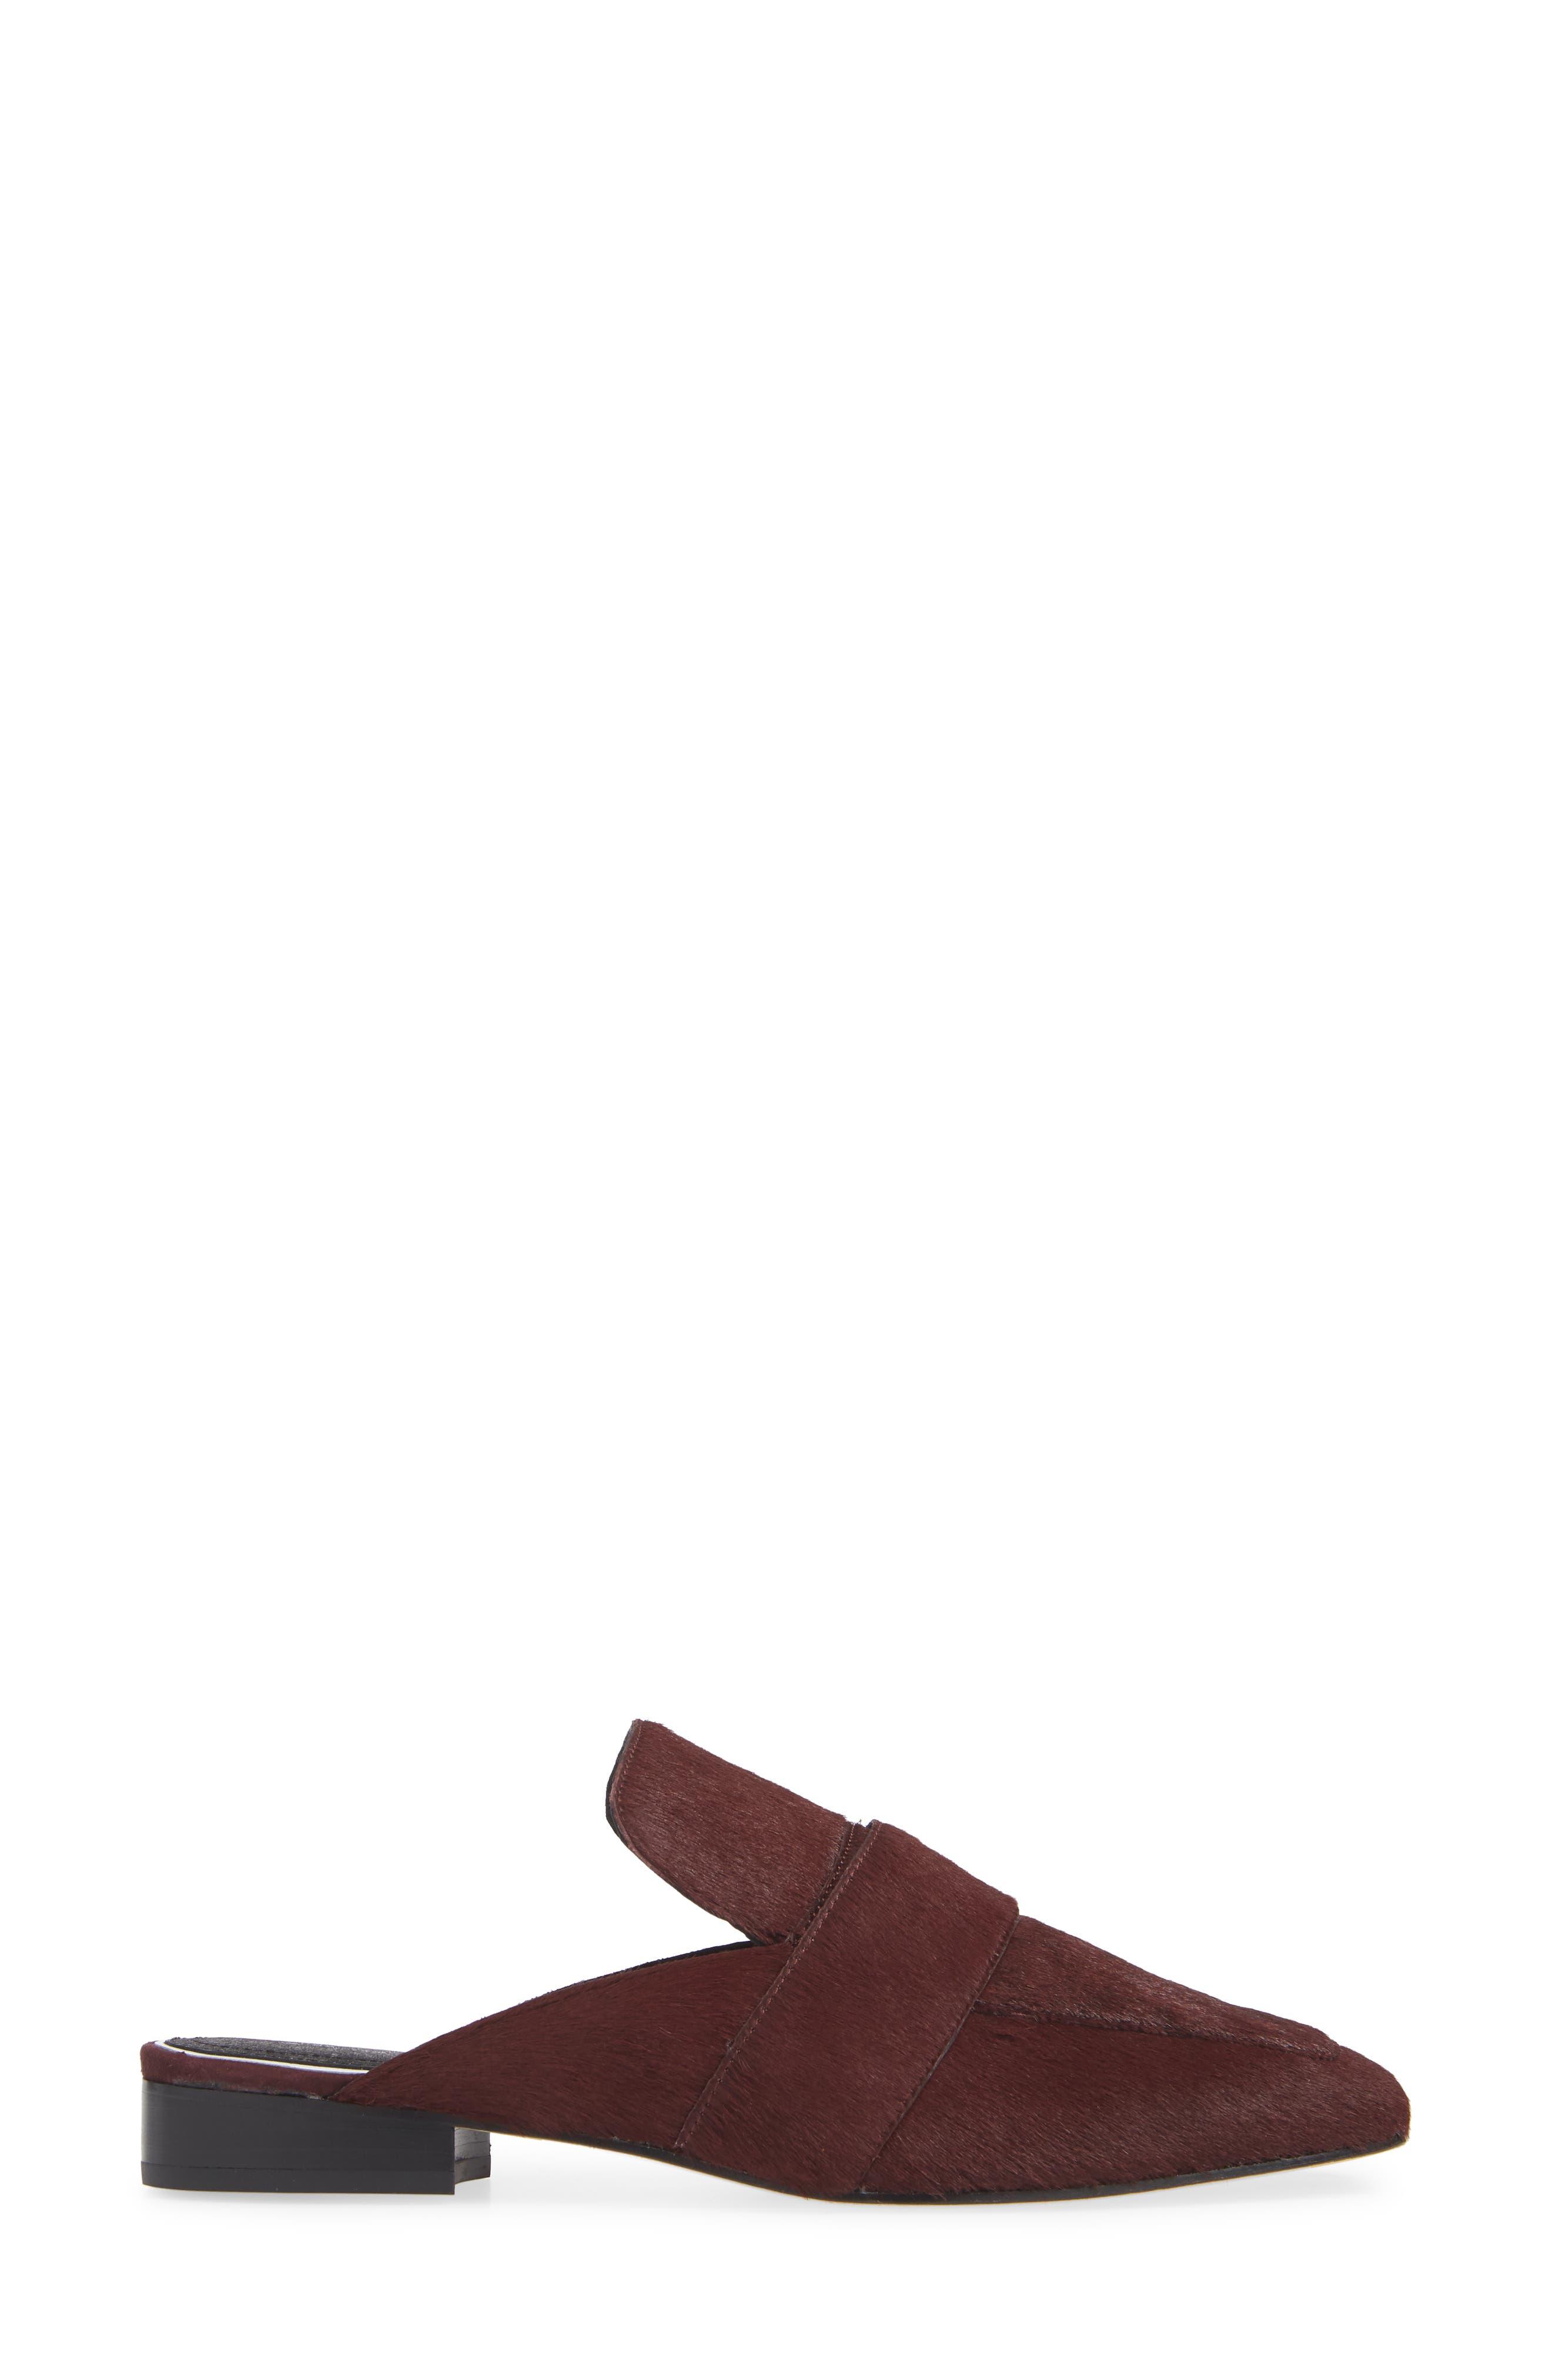 Aslen Genuine Calf Hair Loafer Mule,                             Alternate thumbnail 3, color,                             BURGUNDY CALF HAIR